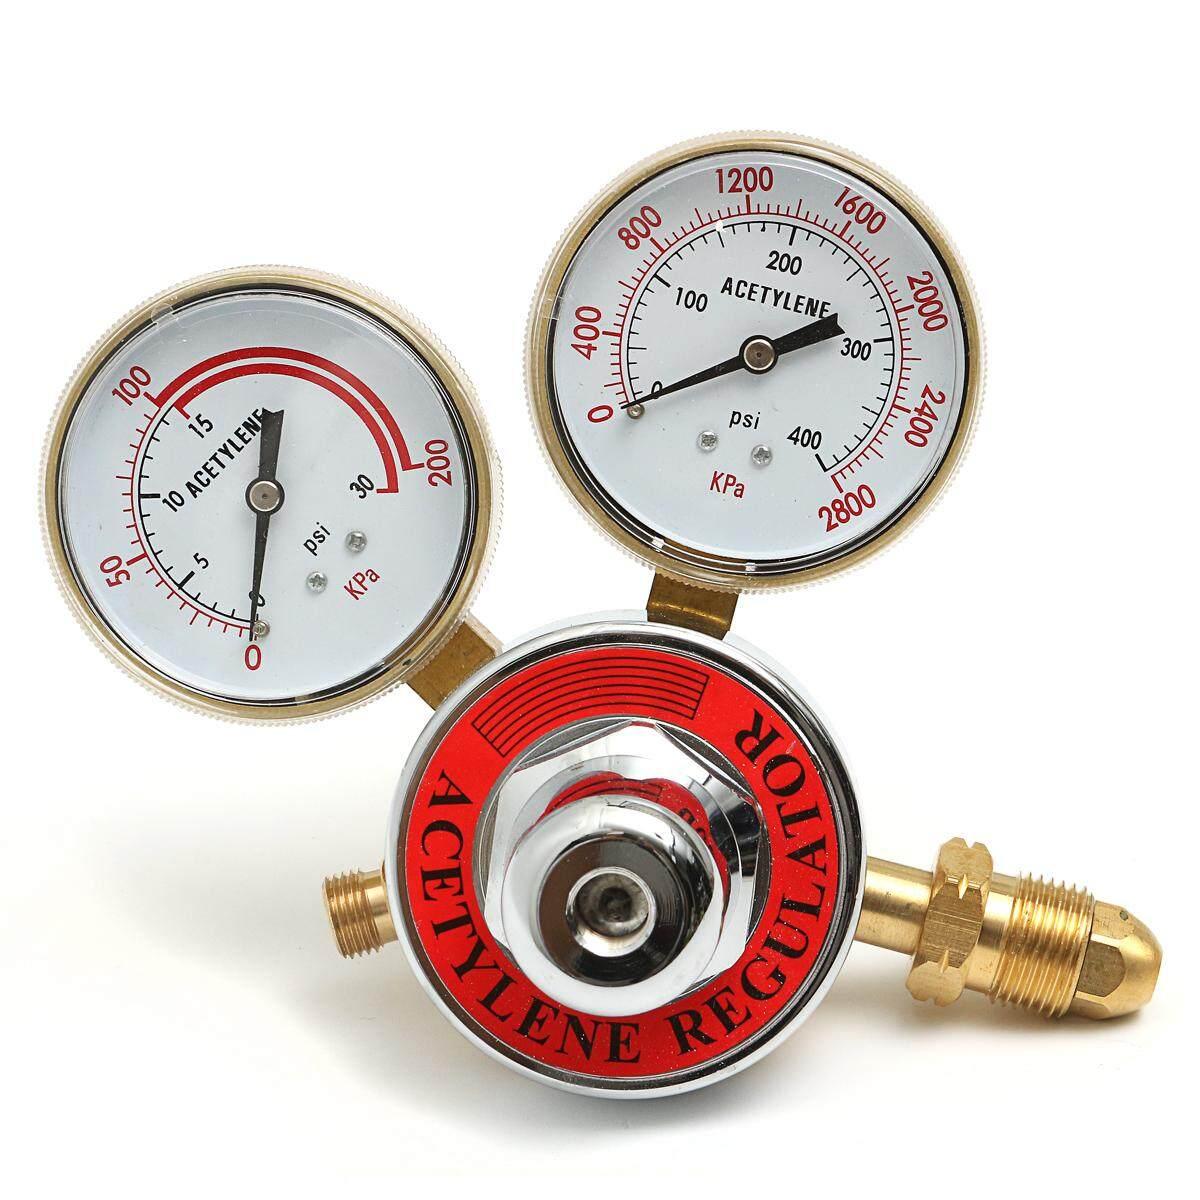 Welding Gas Welder Acetylene Regulator Compatible with Harris Victor Torch Cutting Kits CGA 510 Inlet Pressure 0-400 PSI